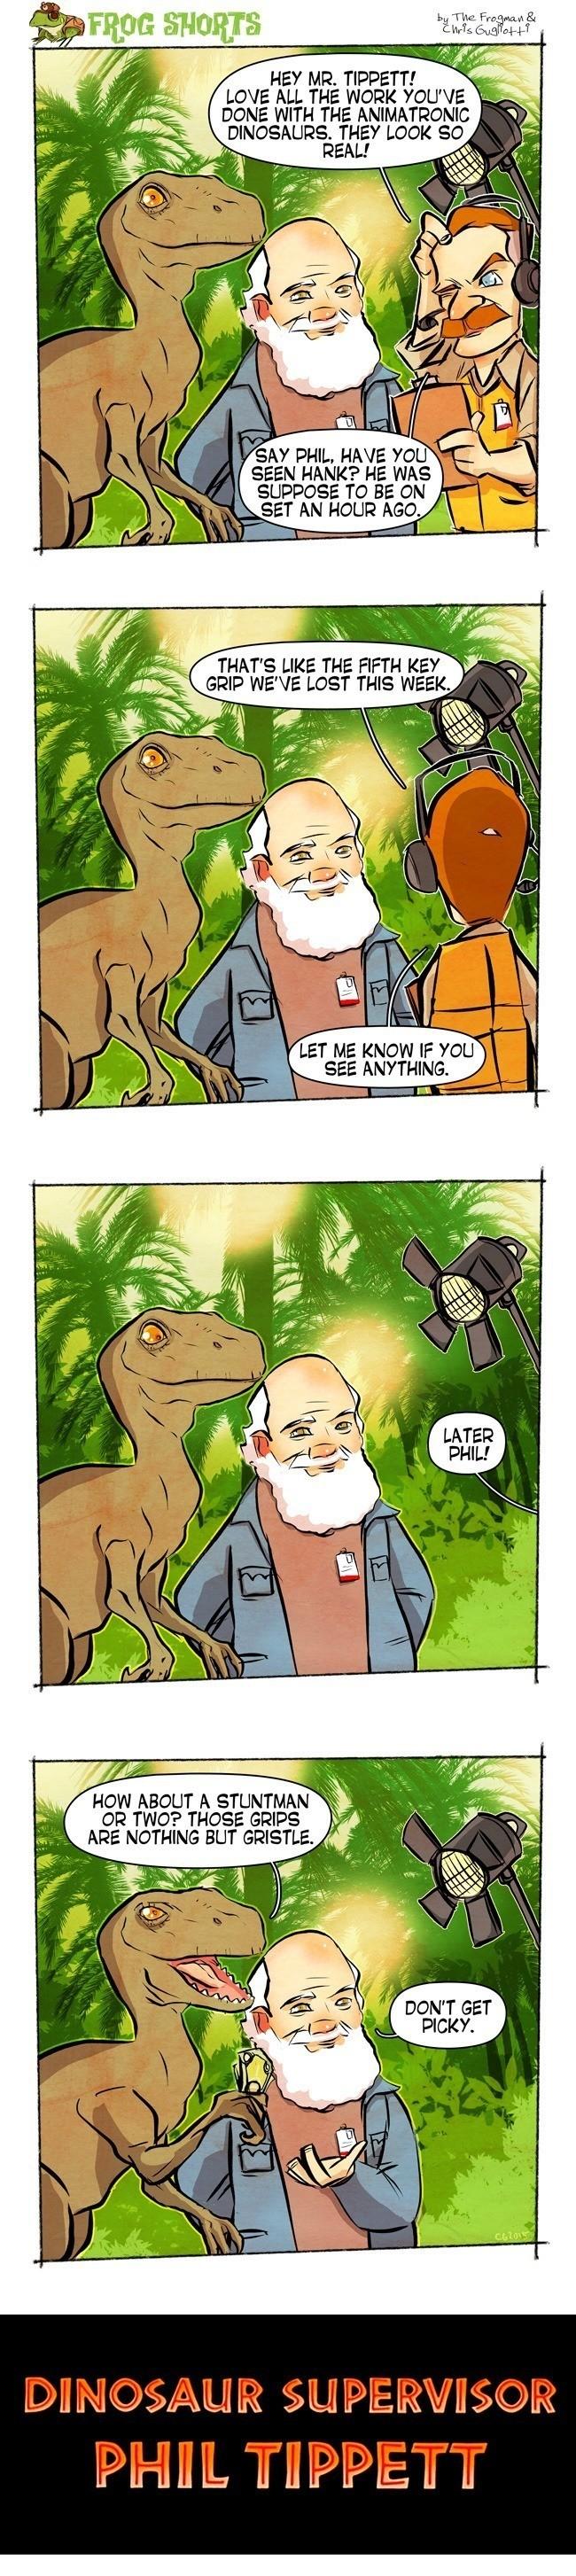 Frog Shorts Dinosaur Supervisor